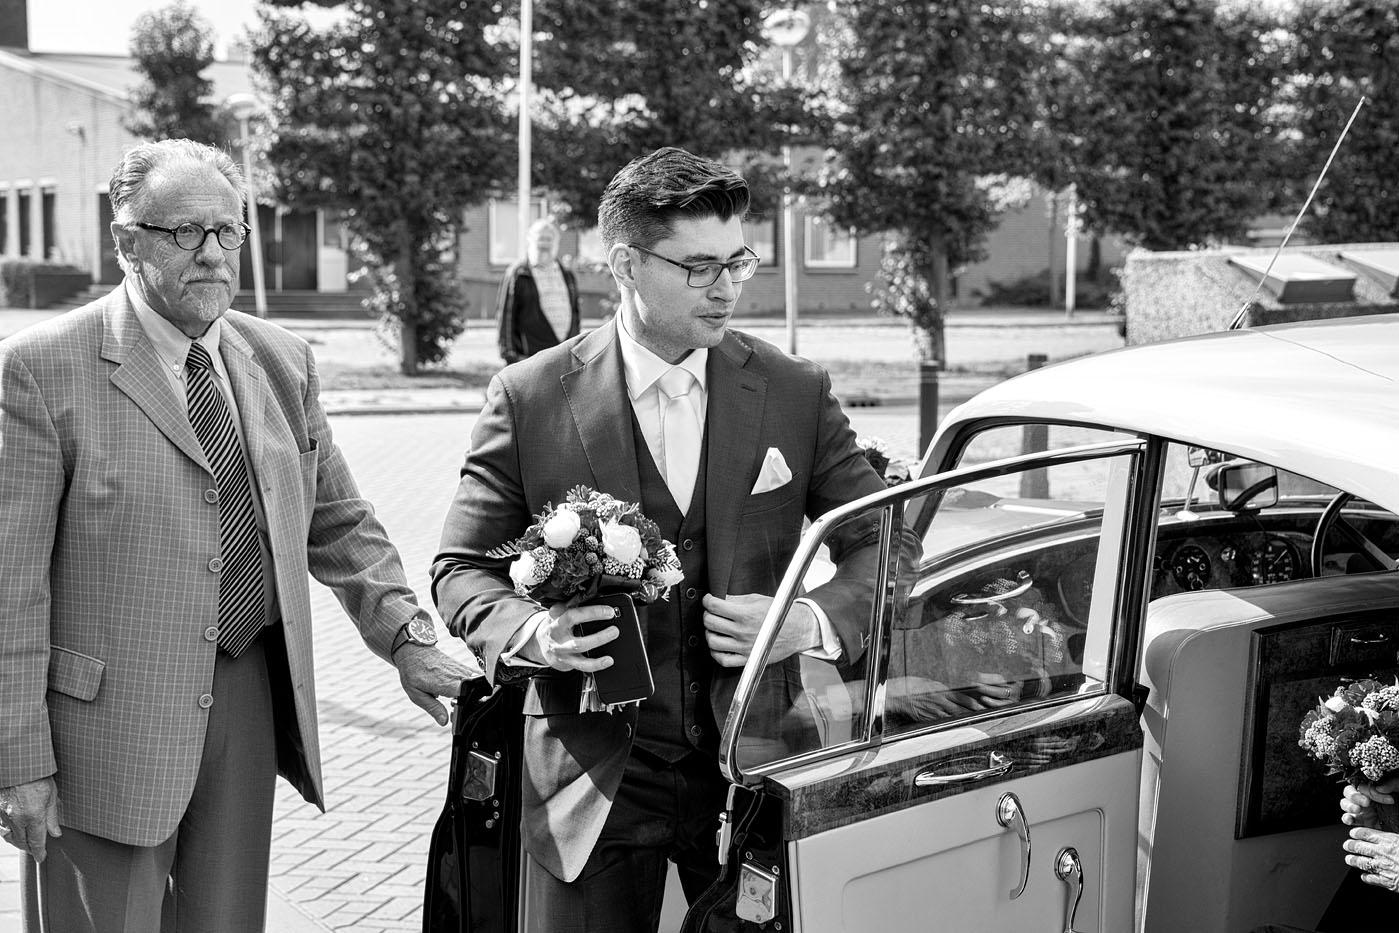 bruiloft-wedding-trouwen-fotograaf-chinees-bobhersbach-rotterdam-auto